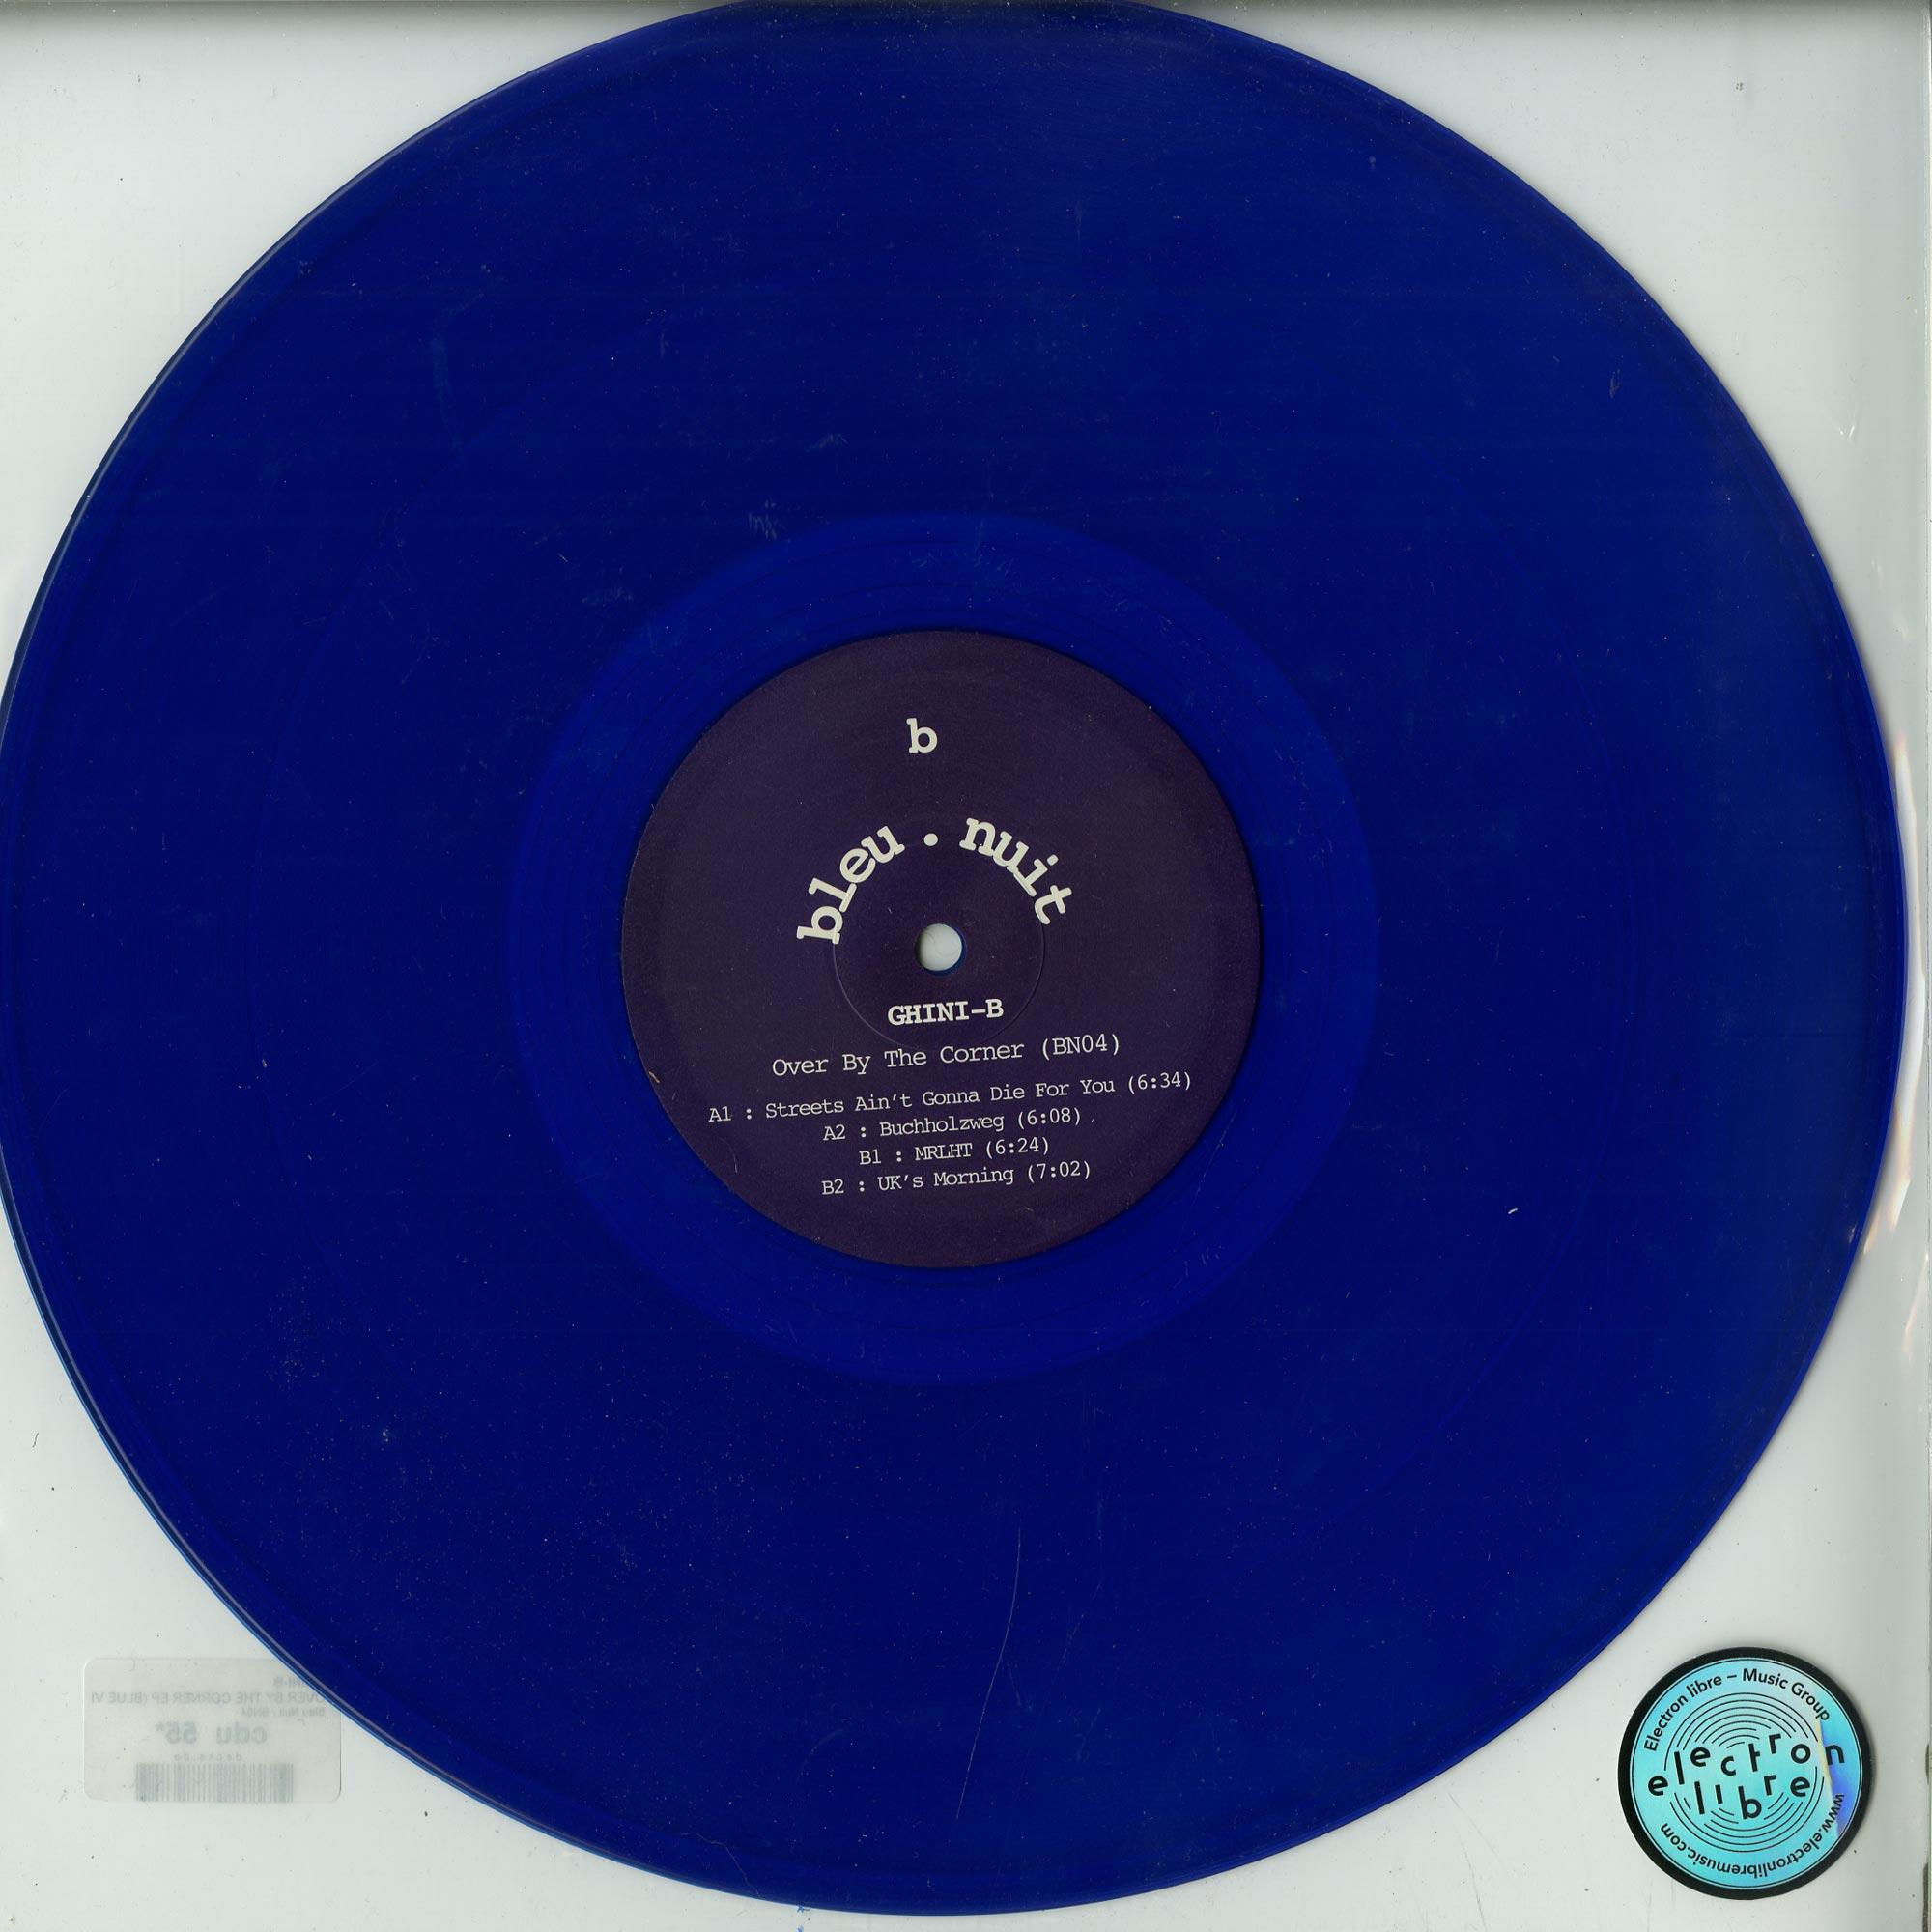 Ghini-B - OVER BY THE CORNER EP